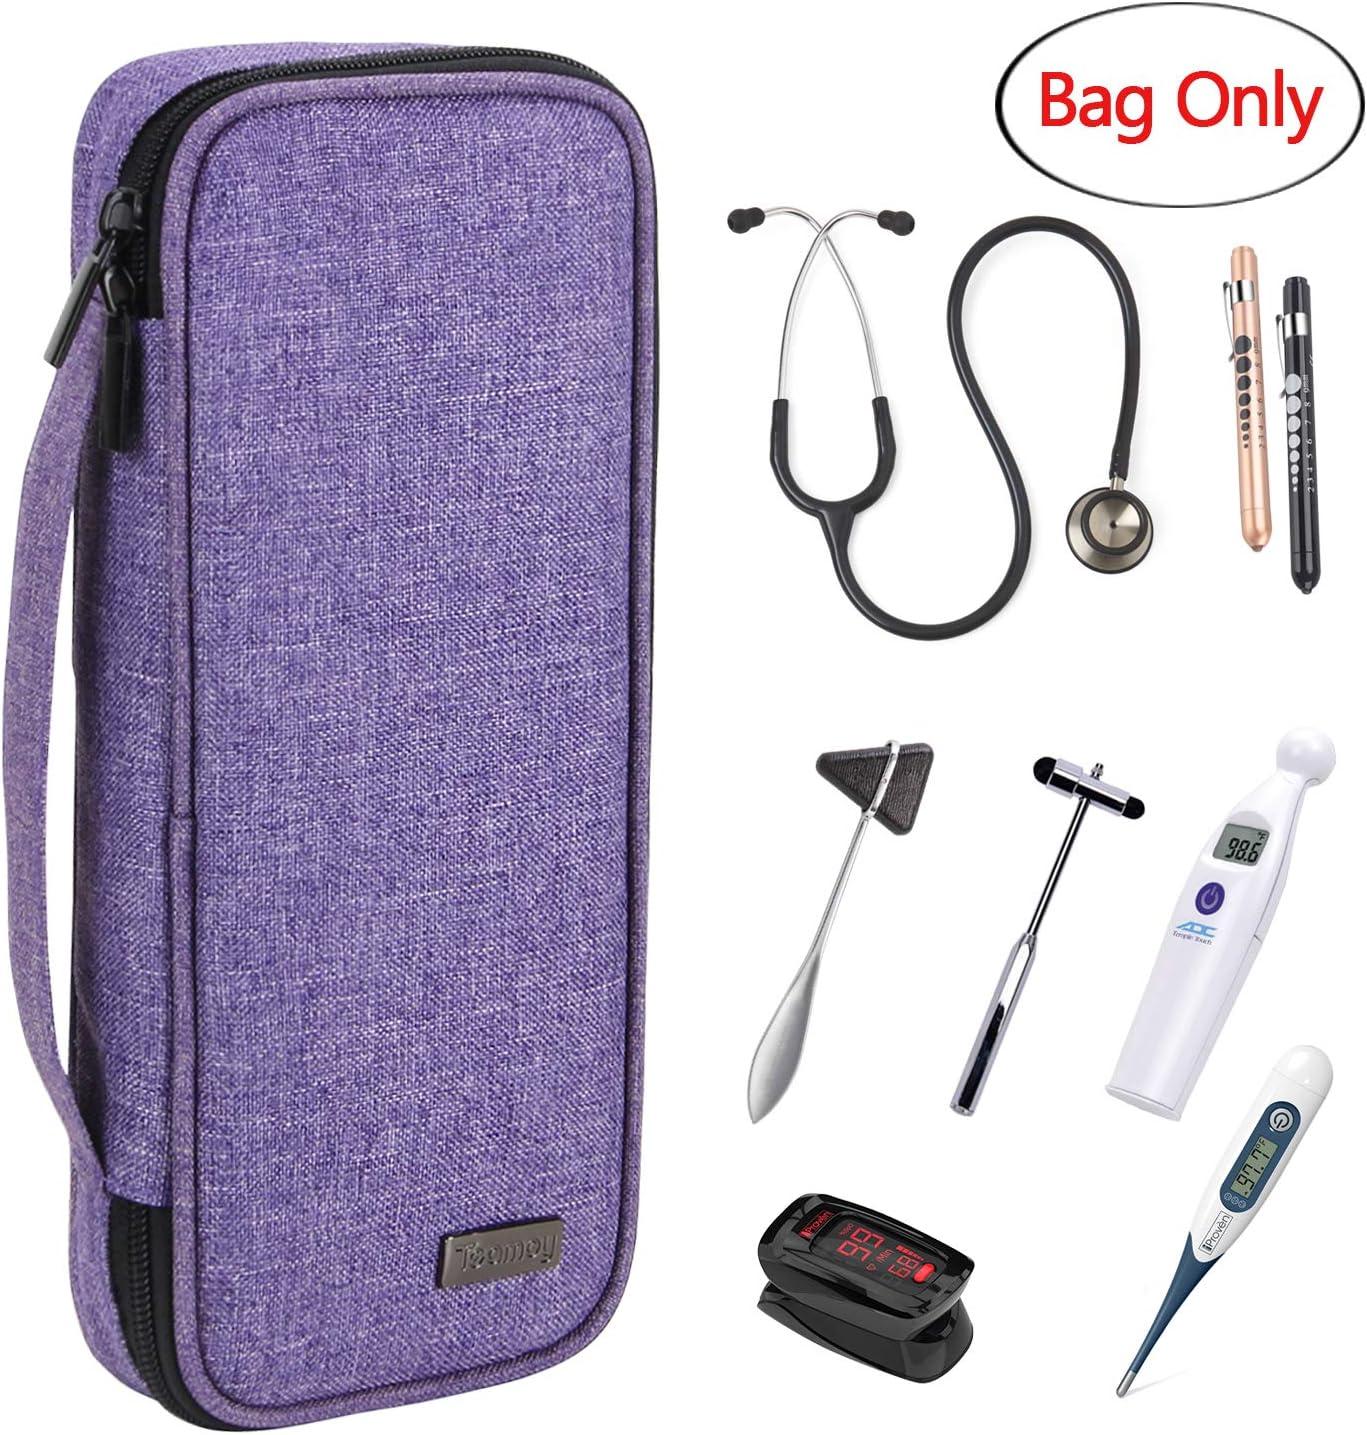 Teamoy estuche para estetoscopio, Bolsa de transporte compatible con el estetoscopio Littmann de 3M, linterna medica, Martillo neurológico y otros accesorios, Púrpura